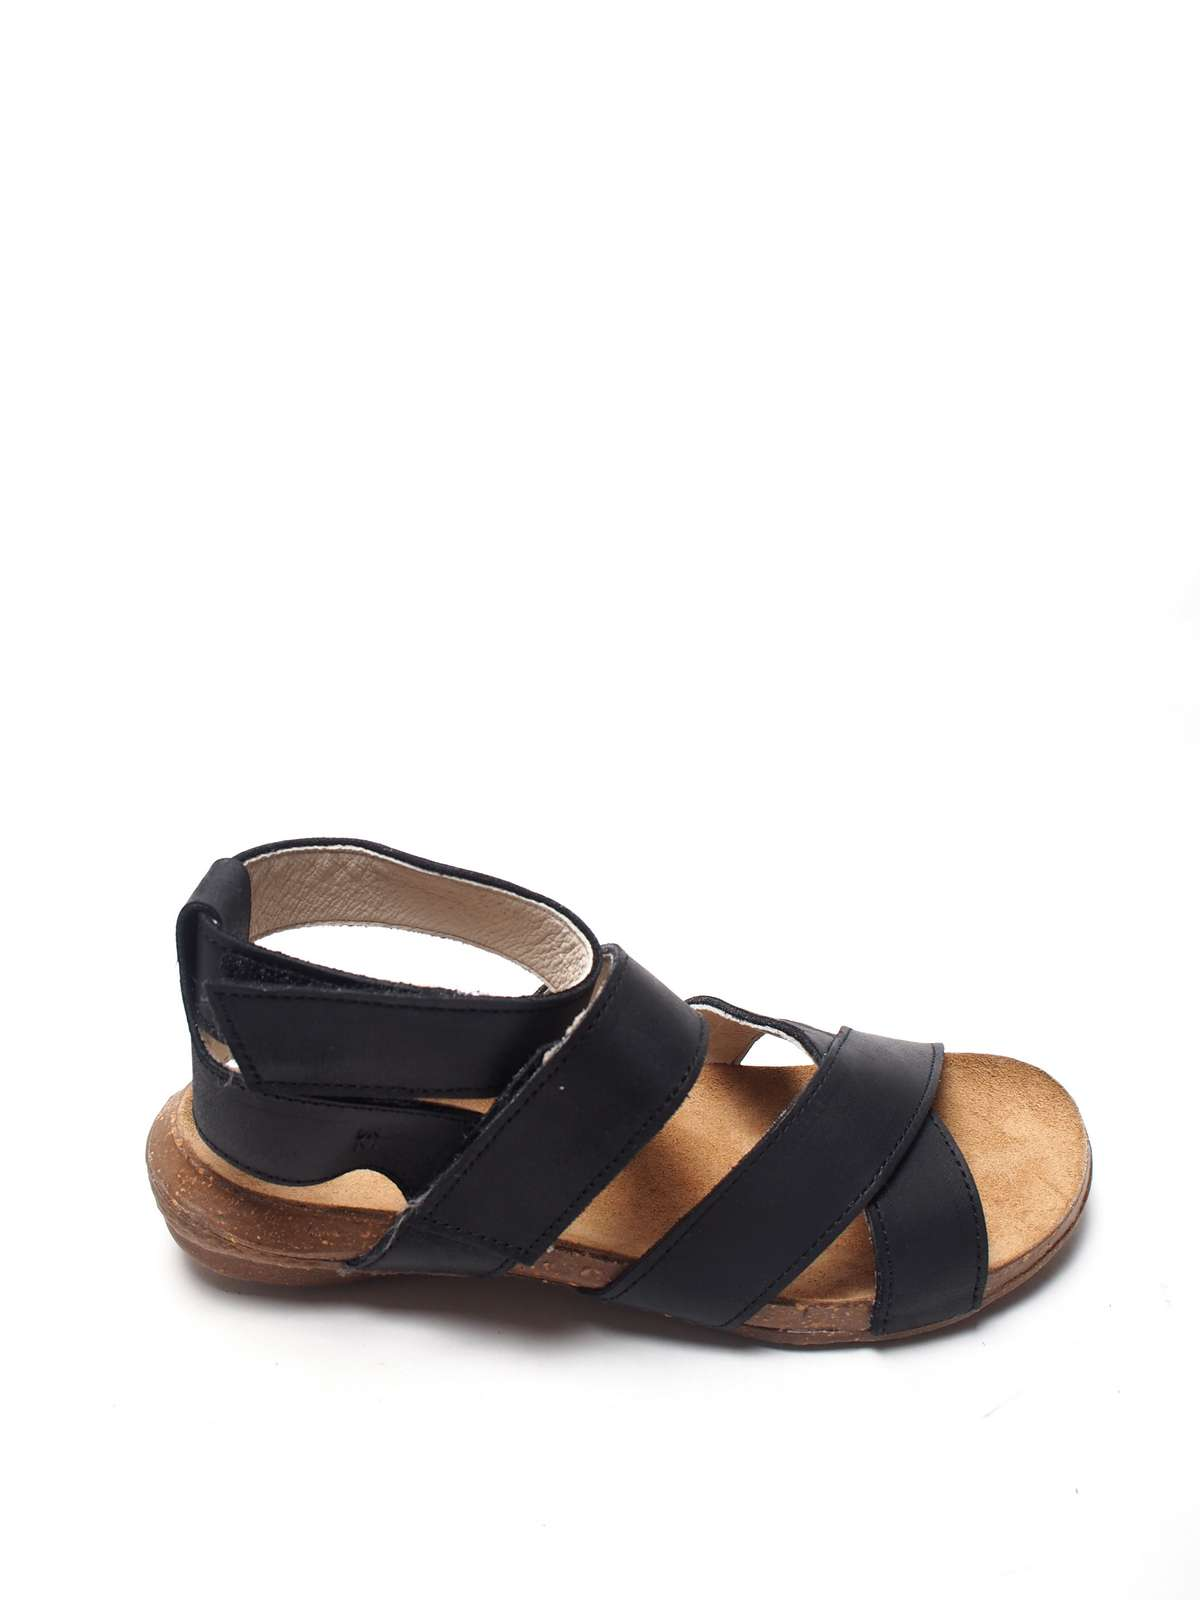 f2100c82fc47 Wakataua N449 Sandal - Black - Katie Kerr - Women s Clothing - UK